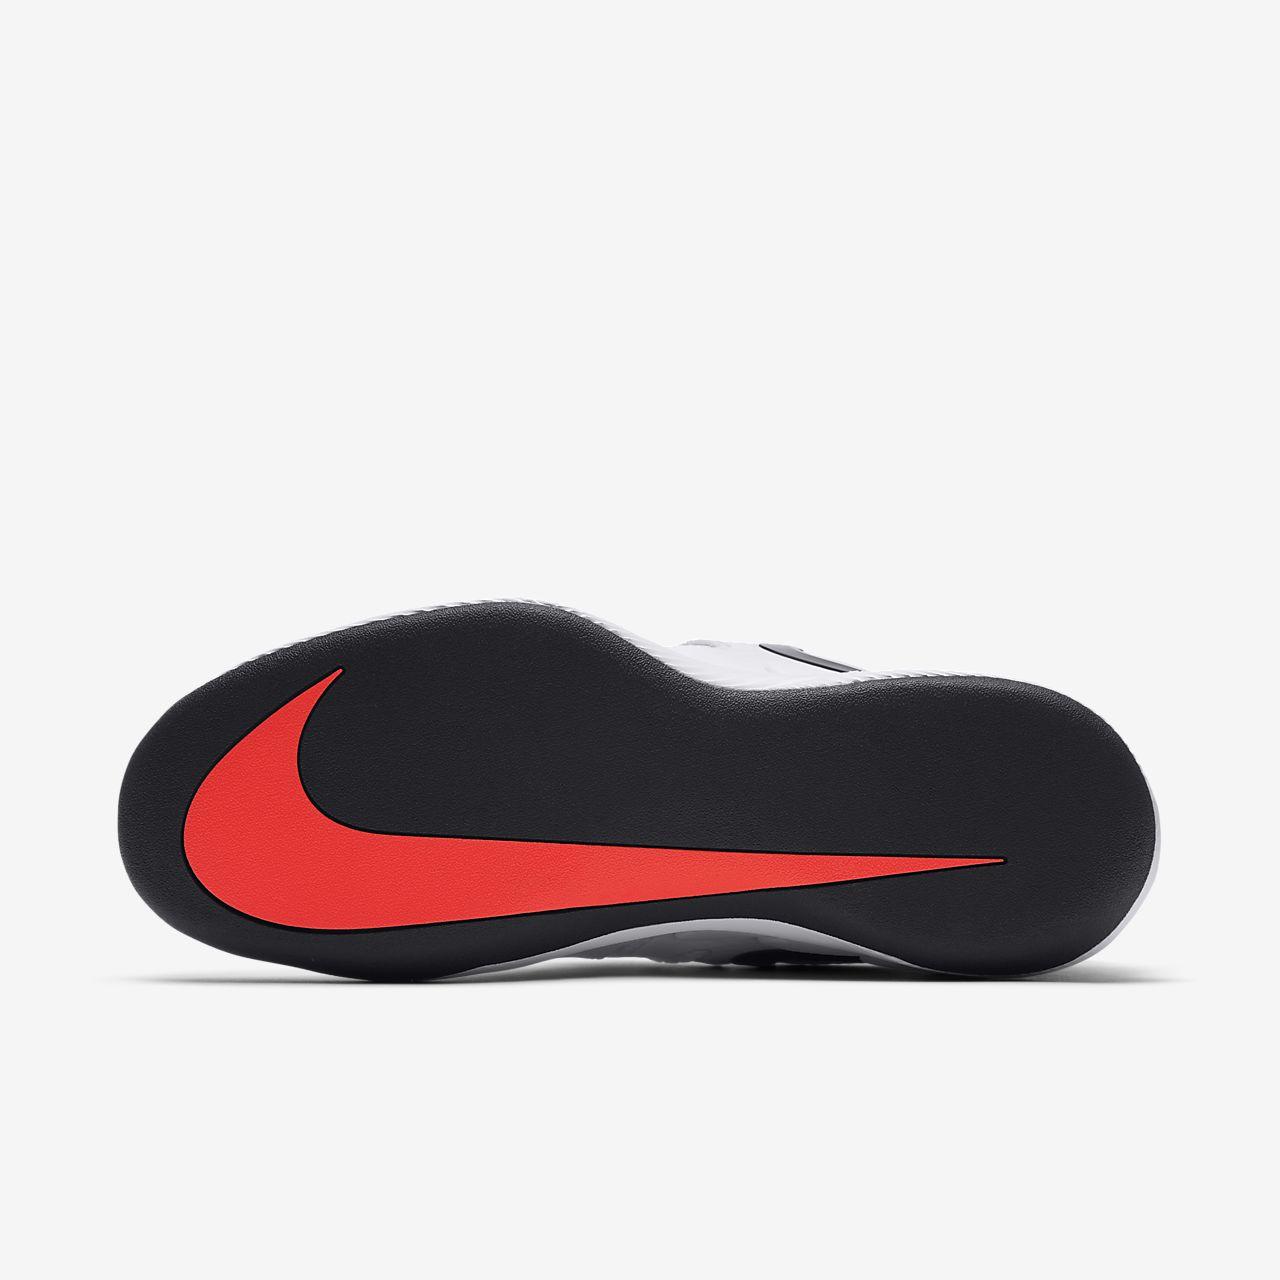 3b90b7d07a Nike Air Zoom Vapor X Carpet Men's Tennis Shoe